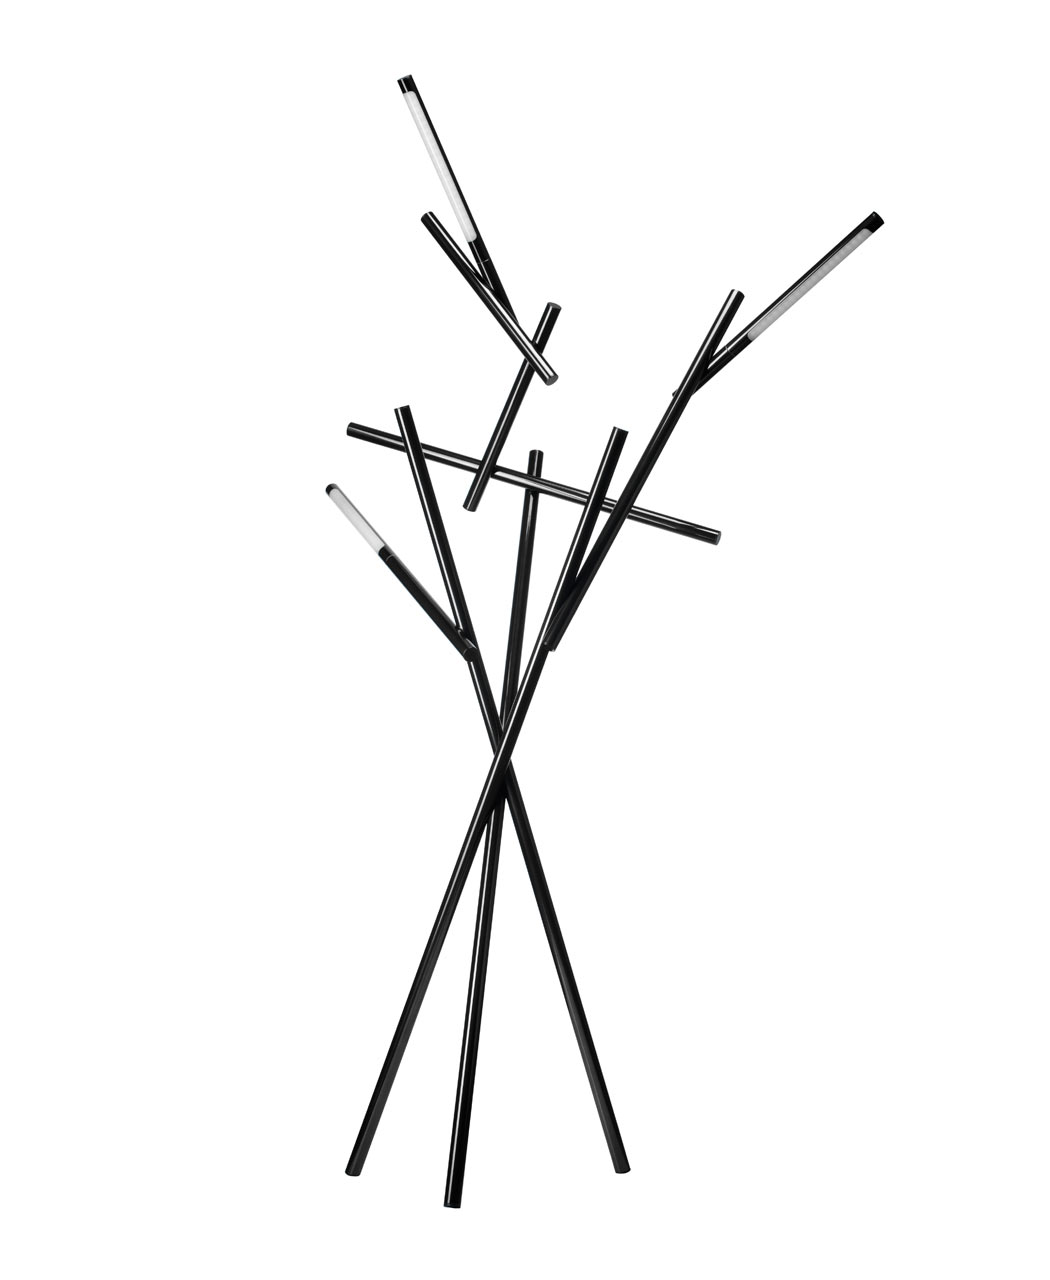 Foscarini-Tuareg-Branch-Lamp-Laviani-2